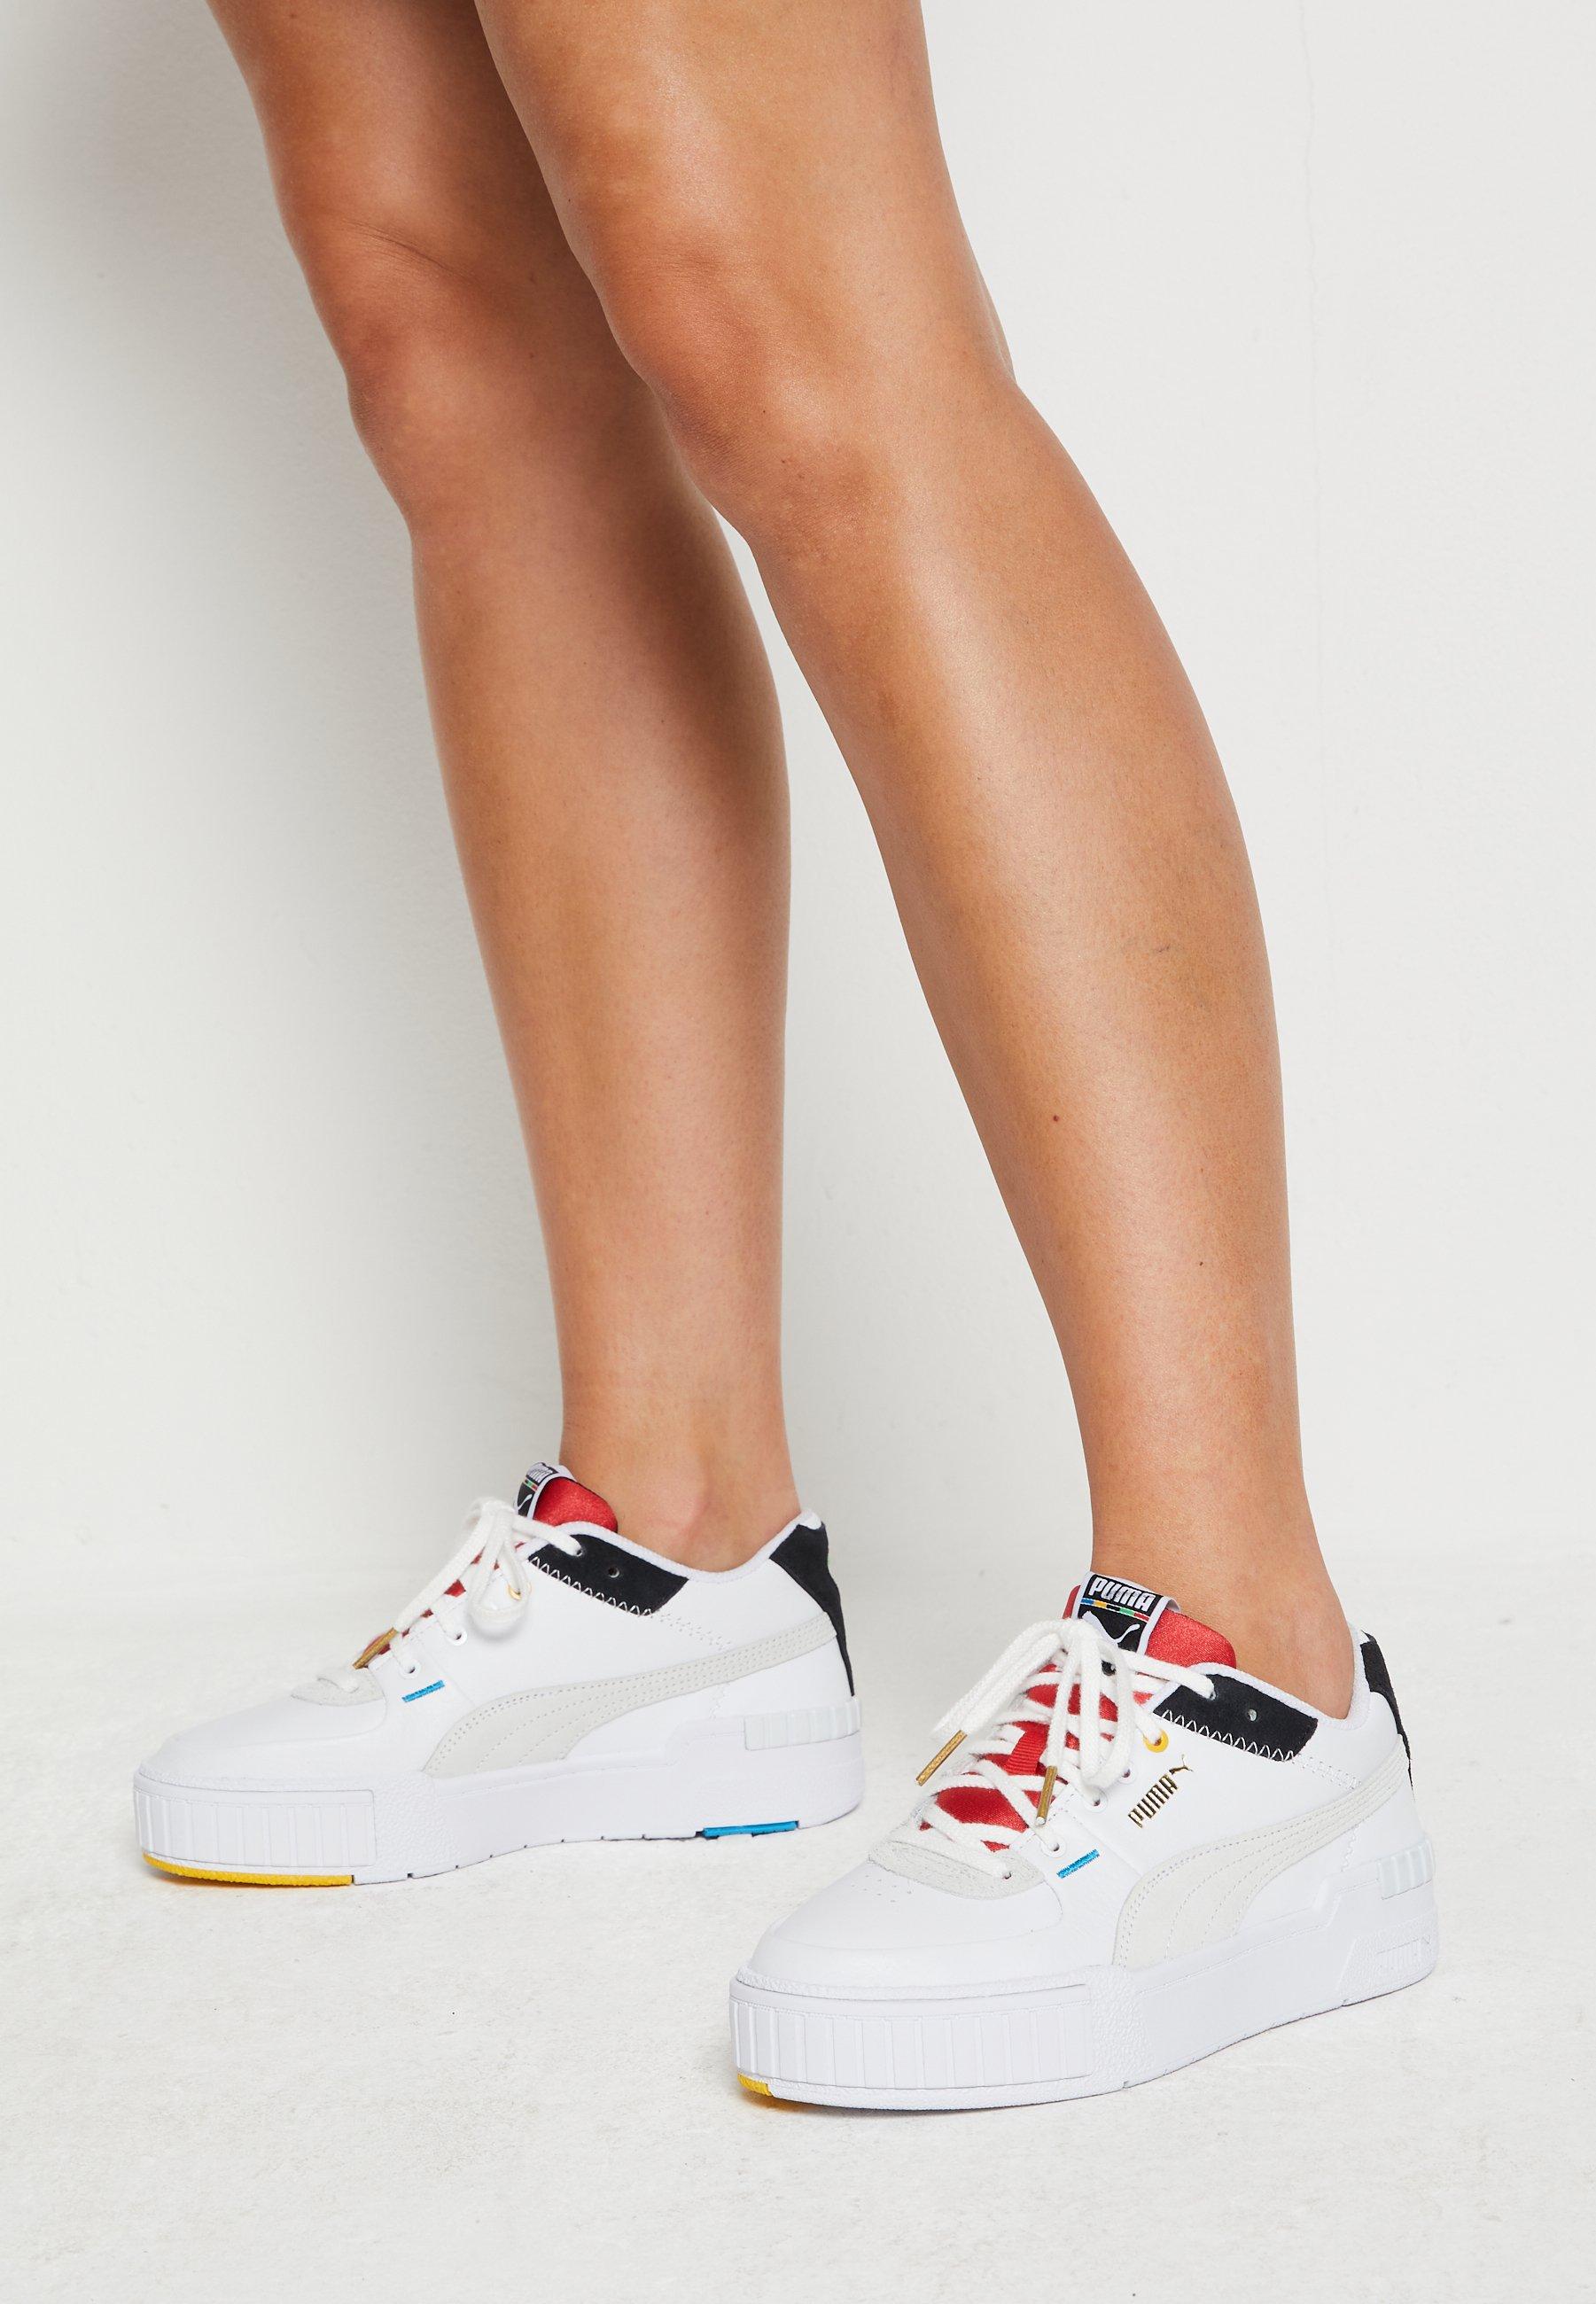 Puma CALI SPORT - Baskets basses - white/black/high risk red/blanc ...